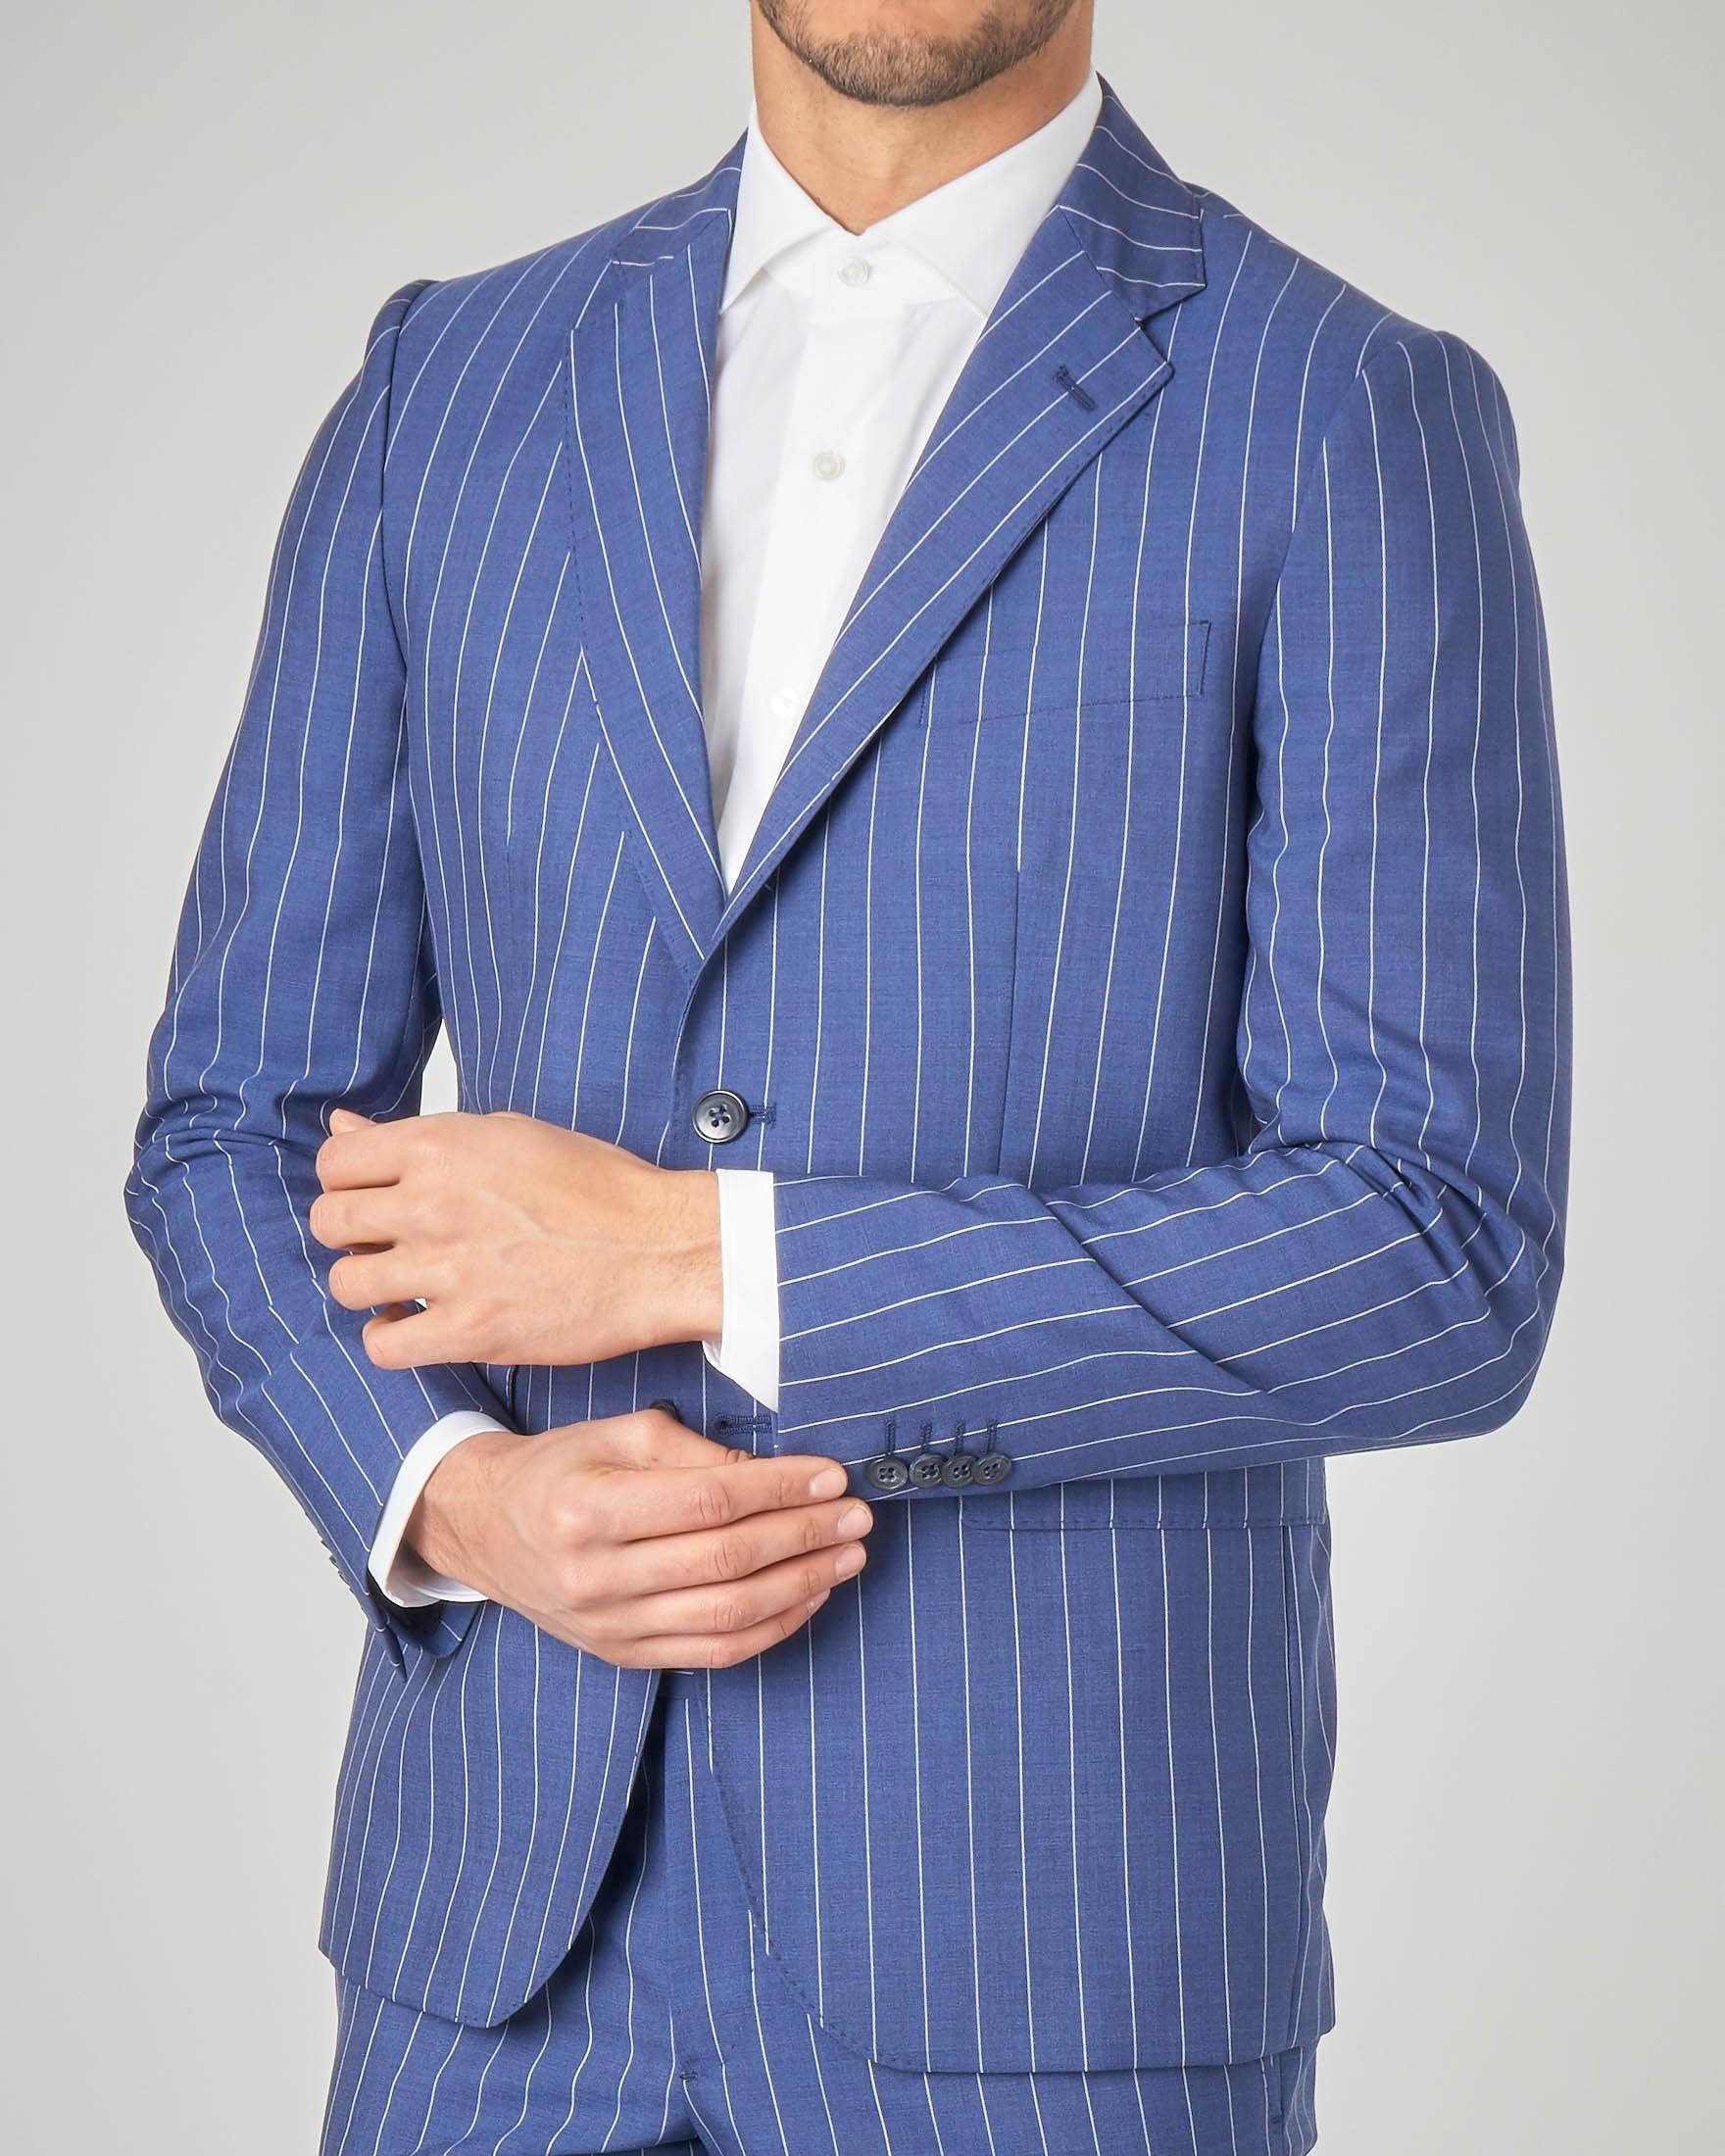 Abito blu royal gessato in tela di lana